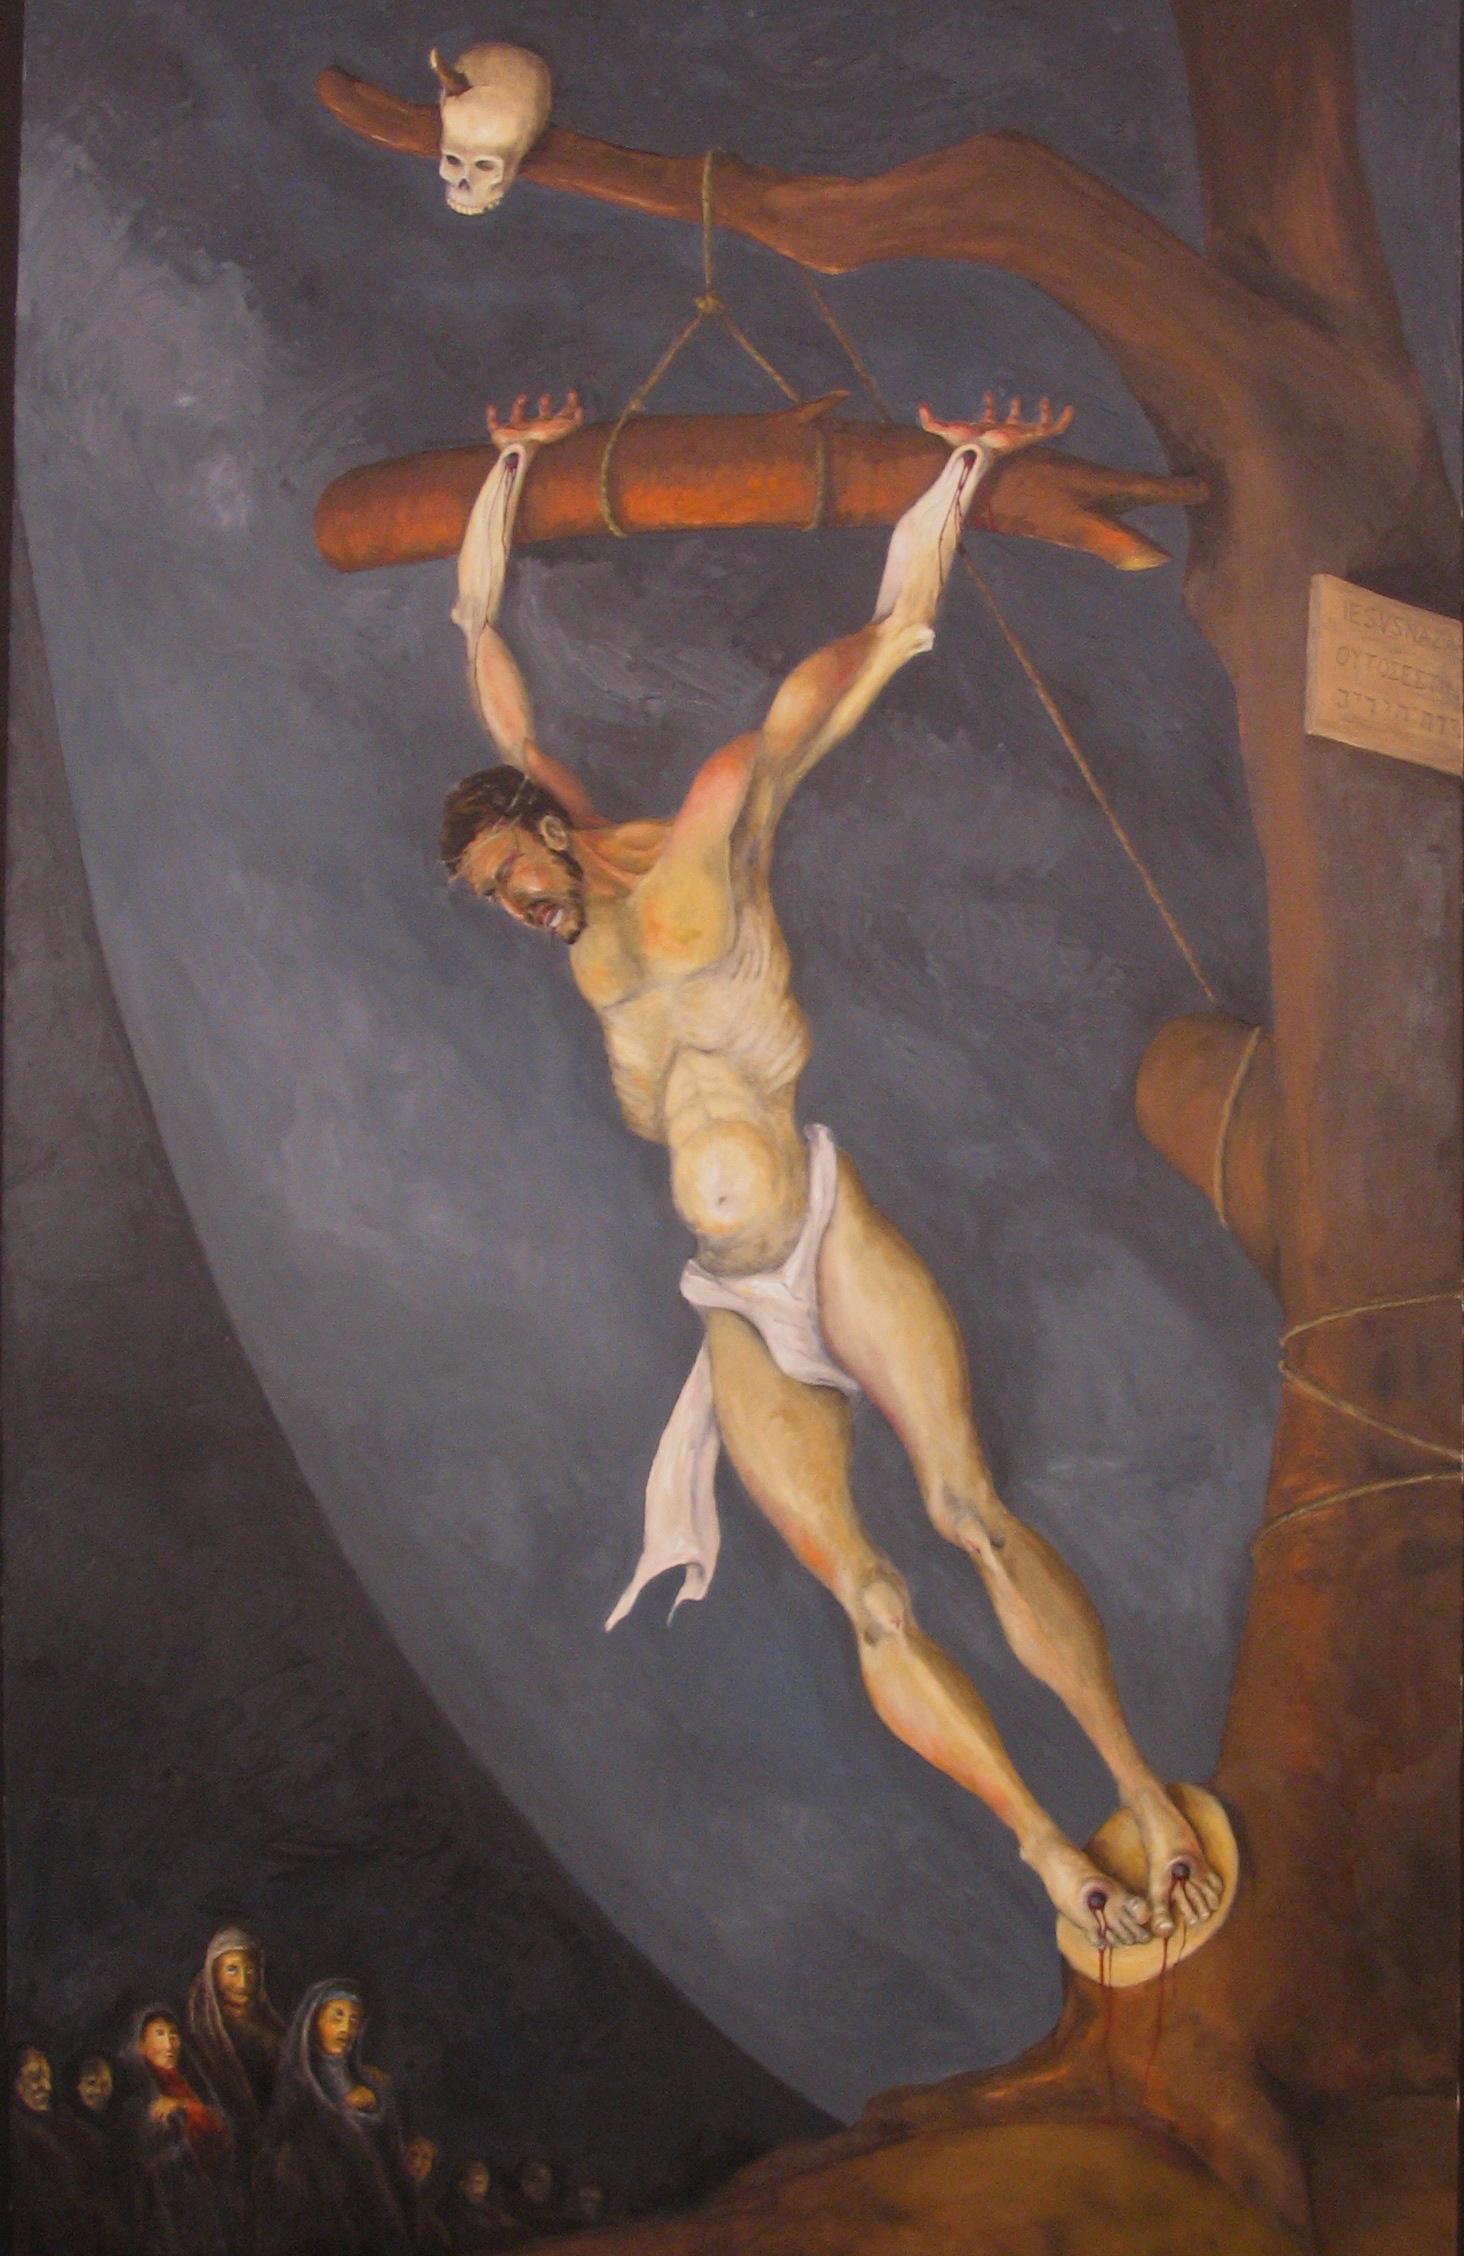 Crucifixion #3